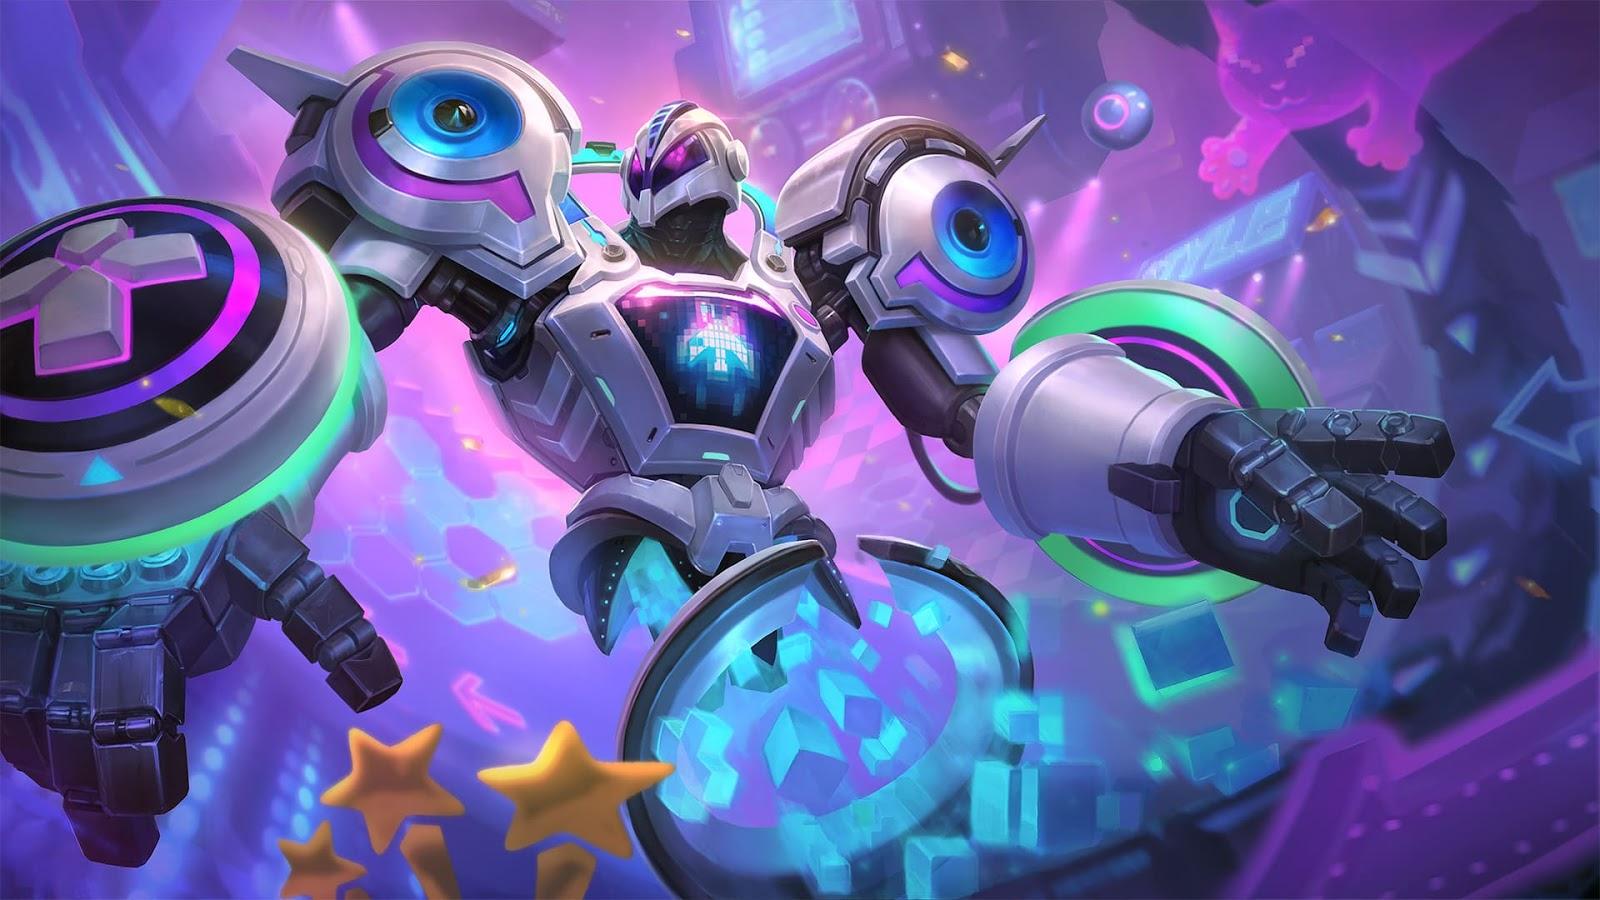 Wallpaper Uranus Video Game Dominator Skin Mobile Legends HD for PC